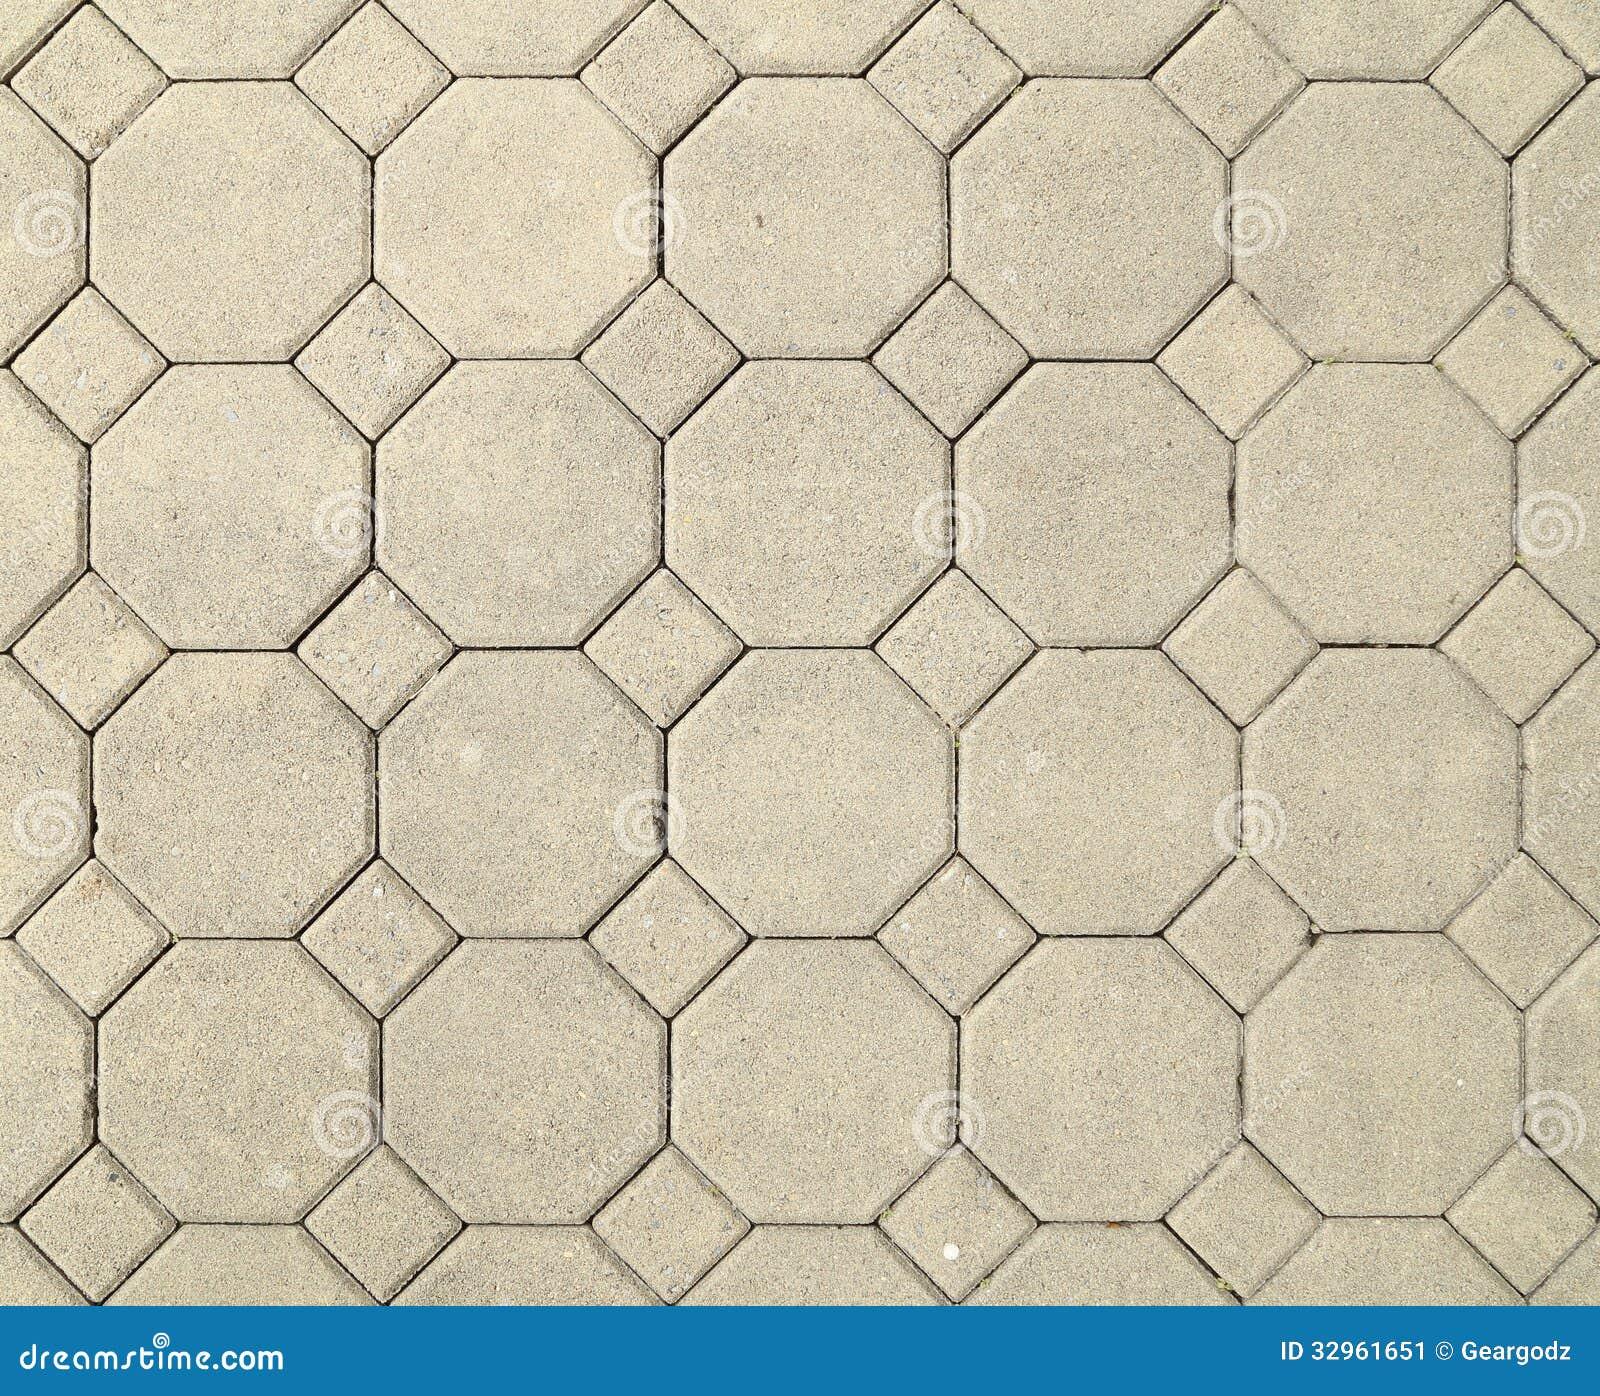 Brick Octagonal Walkway Pavement Texture Stock Image